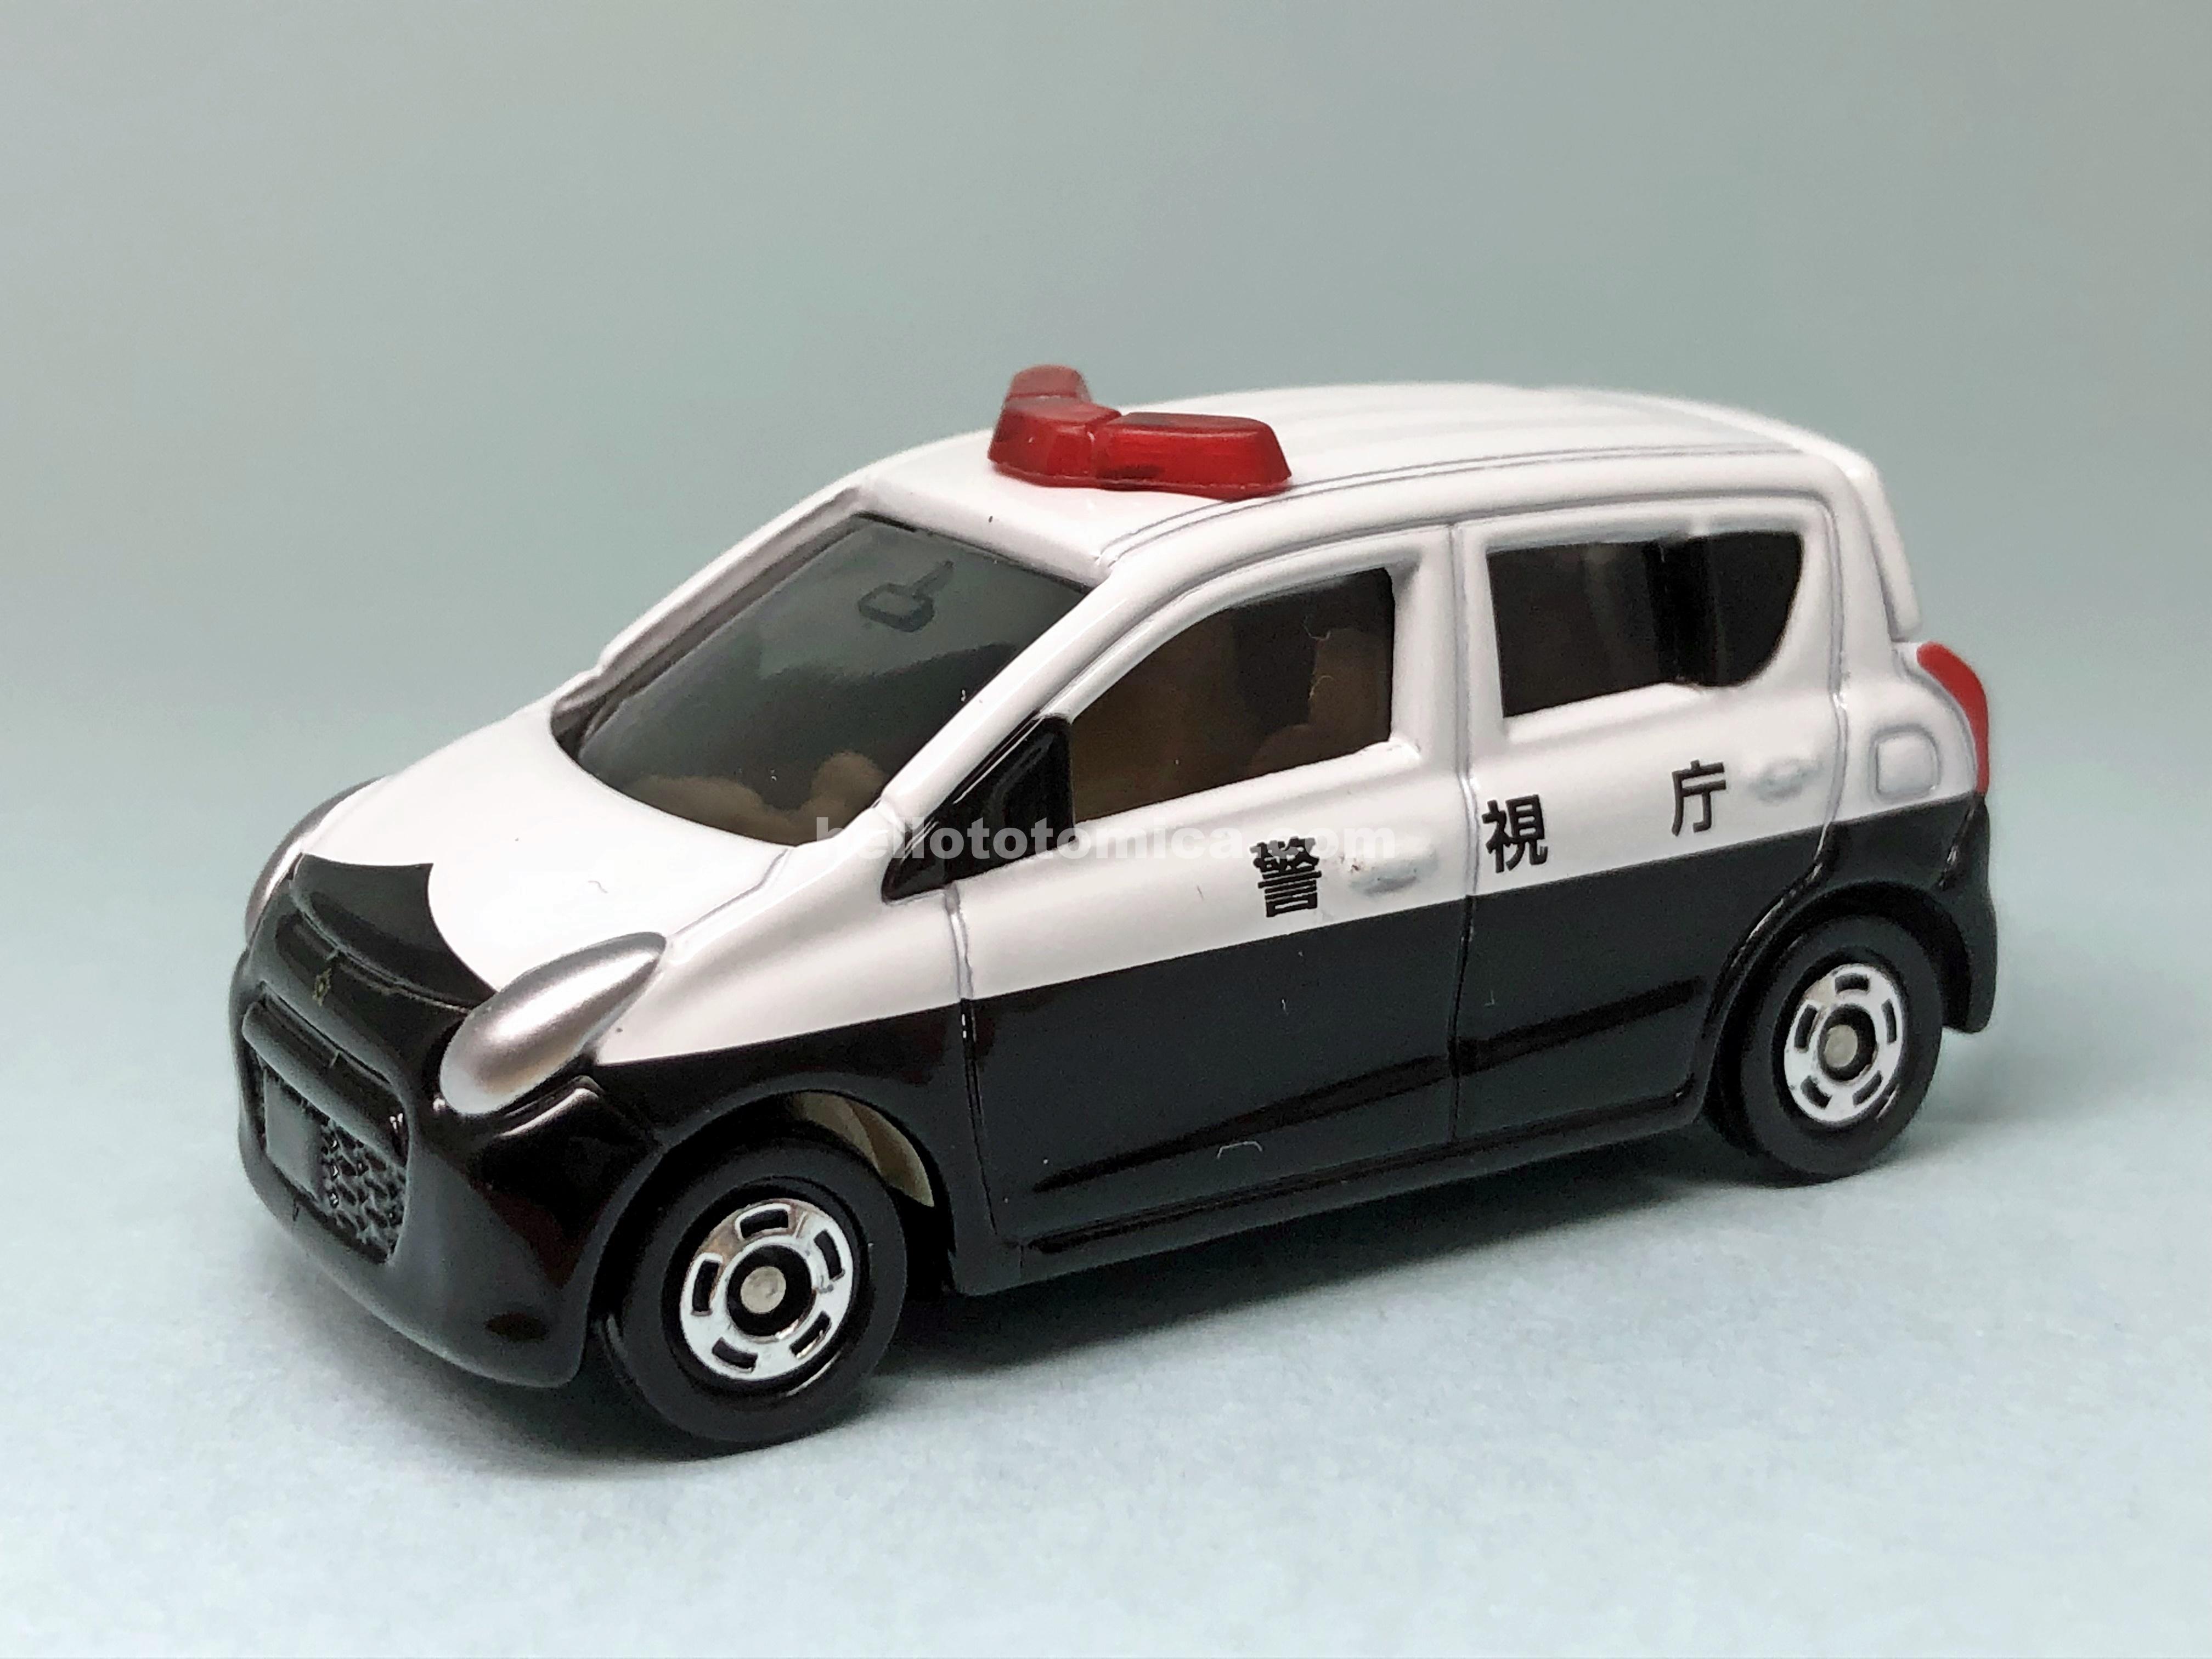 48-9 SUZUKI ALTO PATROL CAR